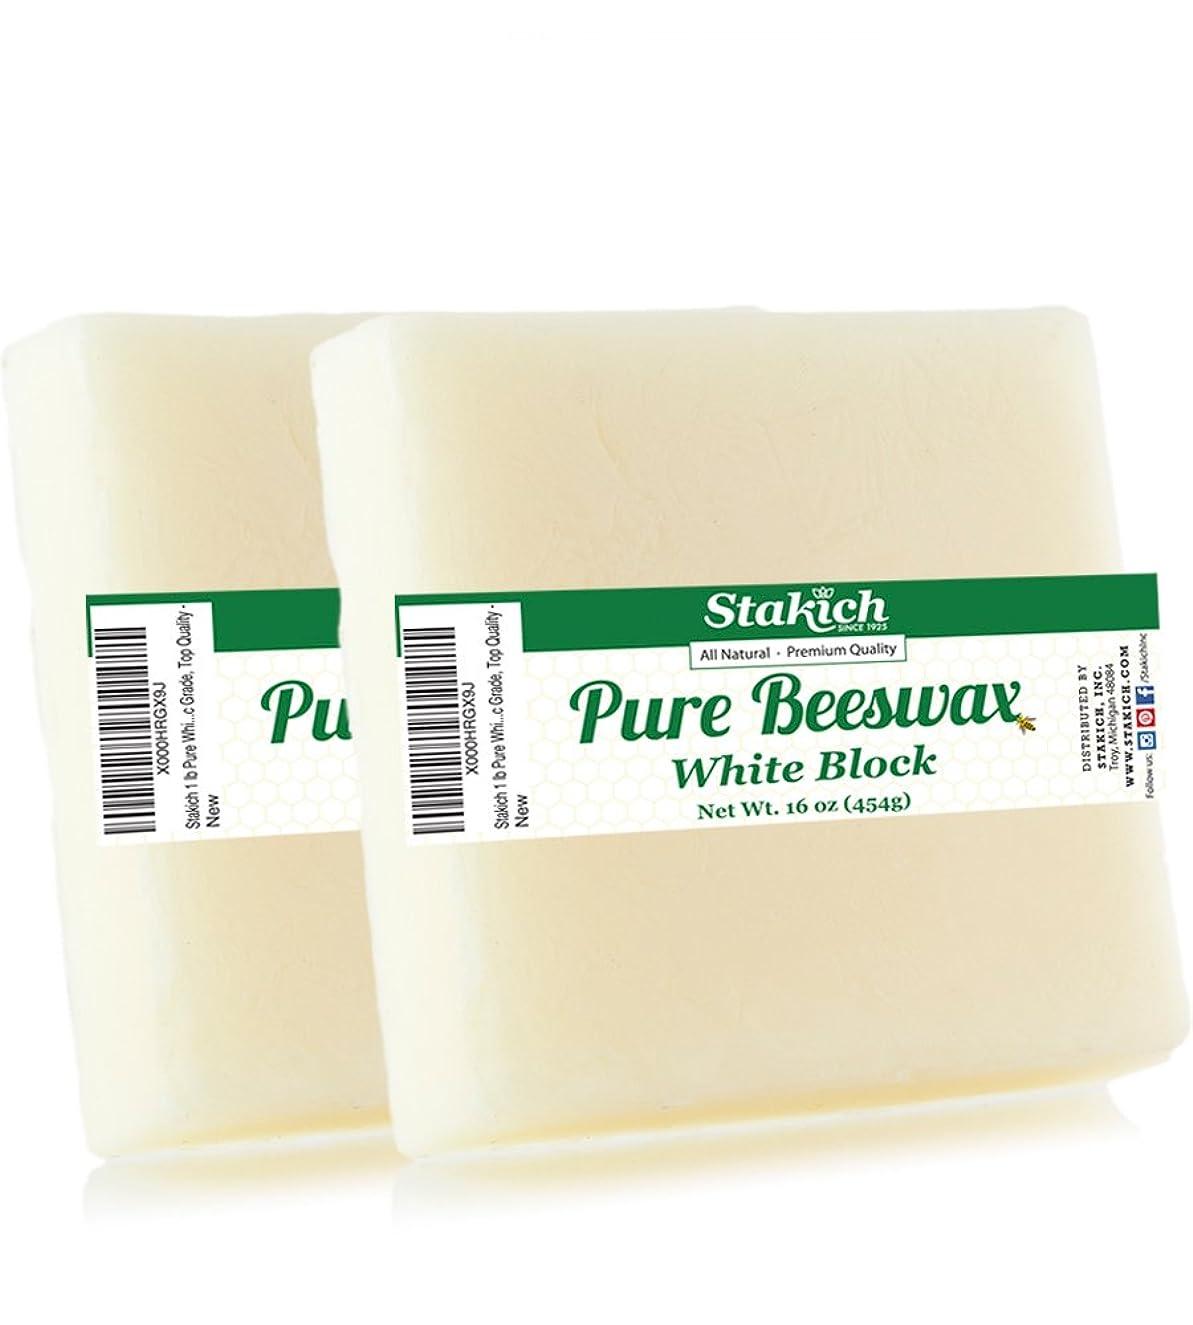 Stakich Pure White BEESWAX Blocks - 100% Natural, Cosmetic Grade, Premium Quality - 2 lb (in 1 lb blocks)